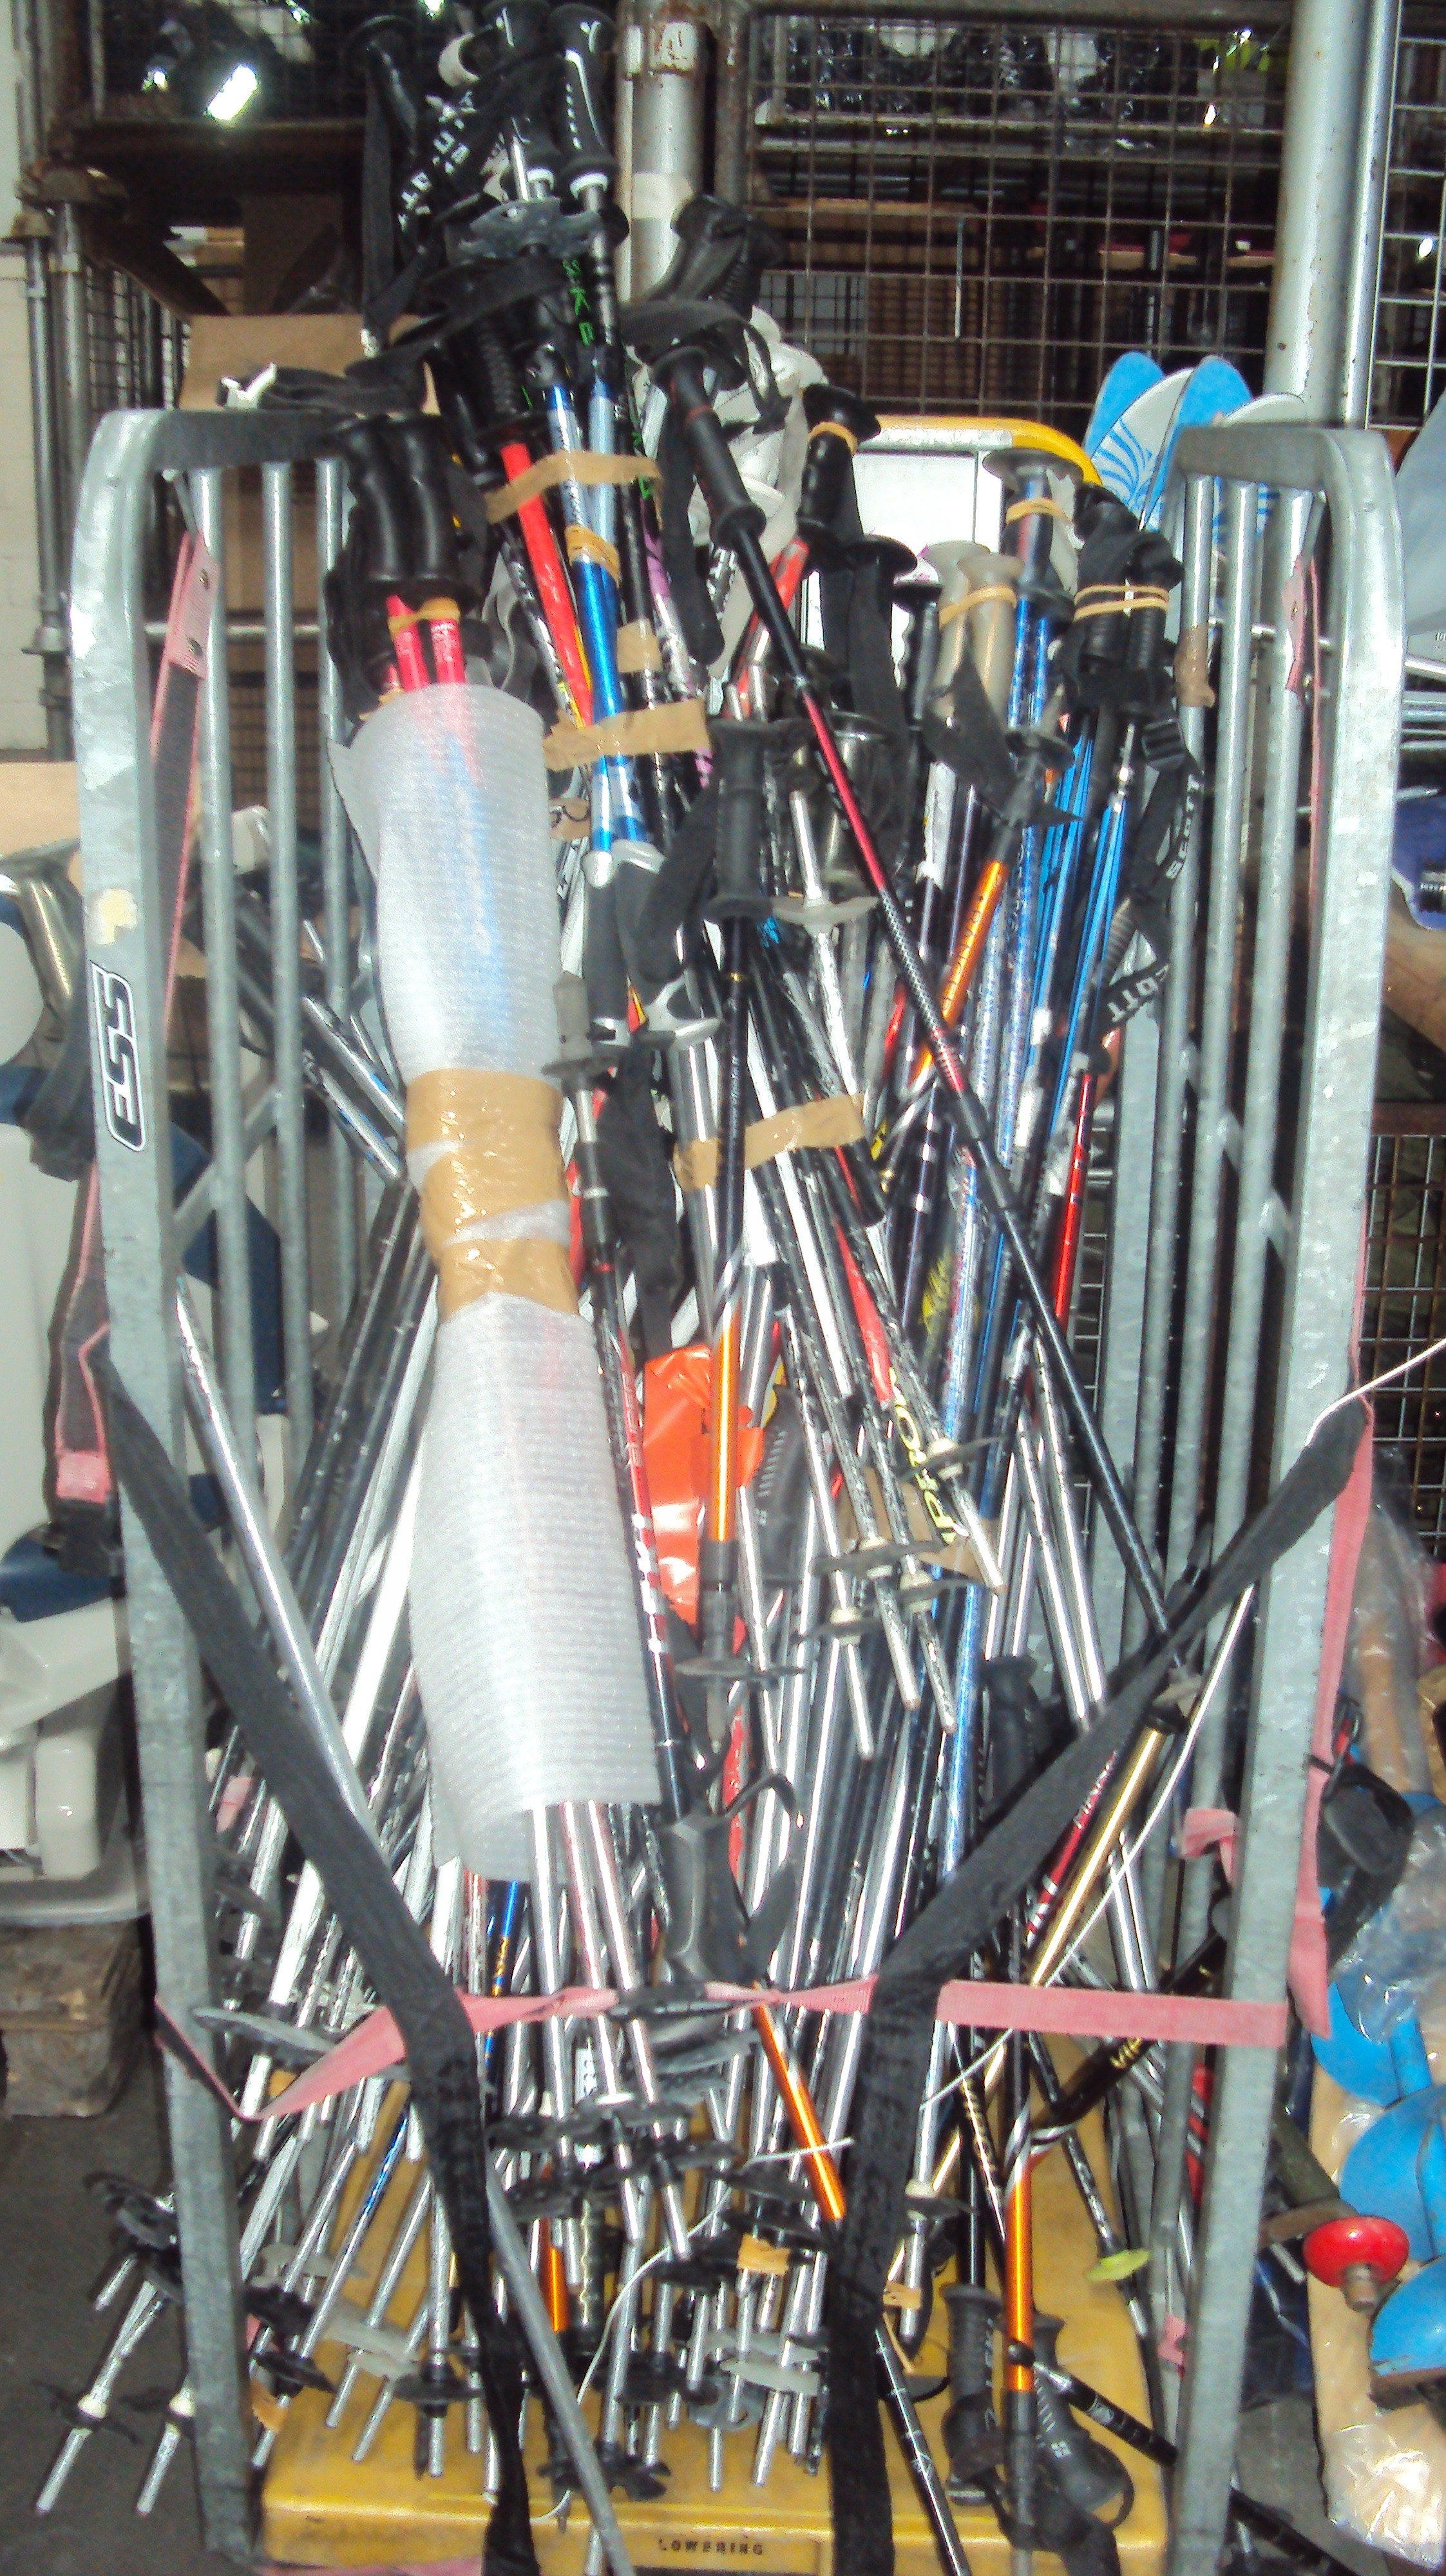 Lot 24 - Ski Poles - Various Sizes - Used